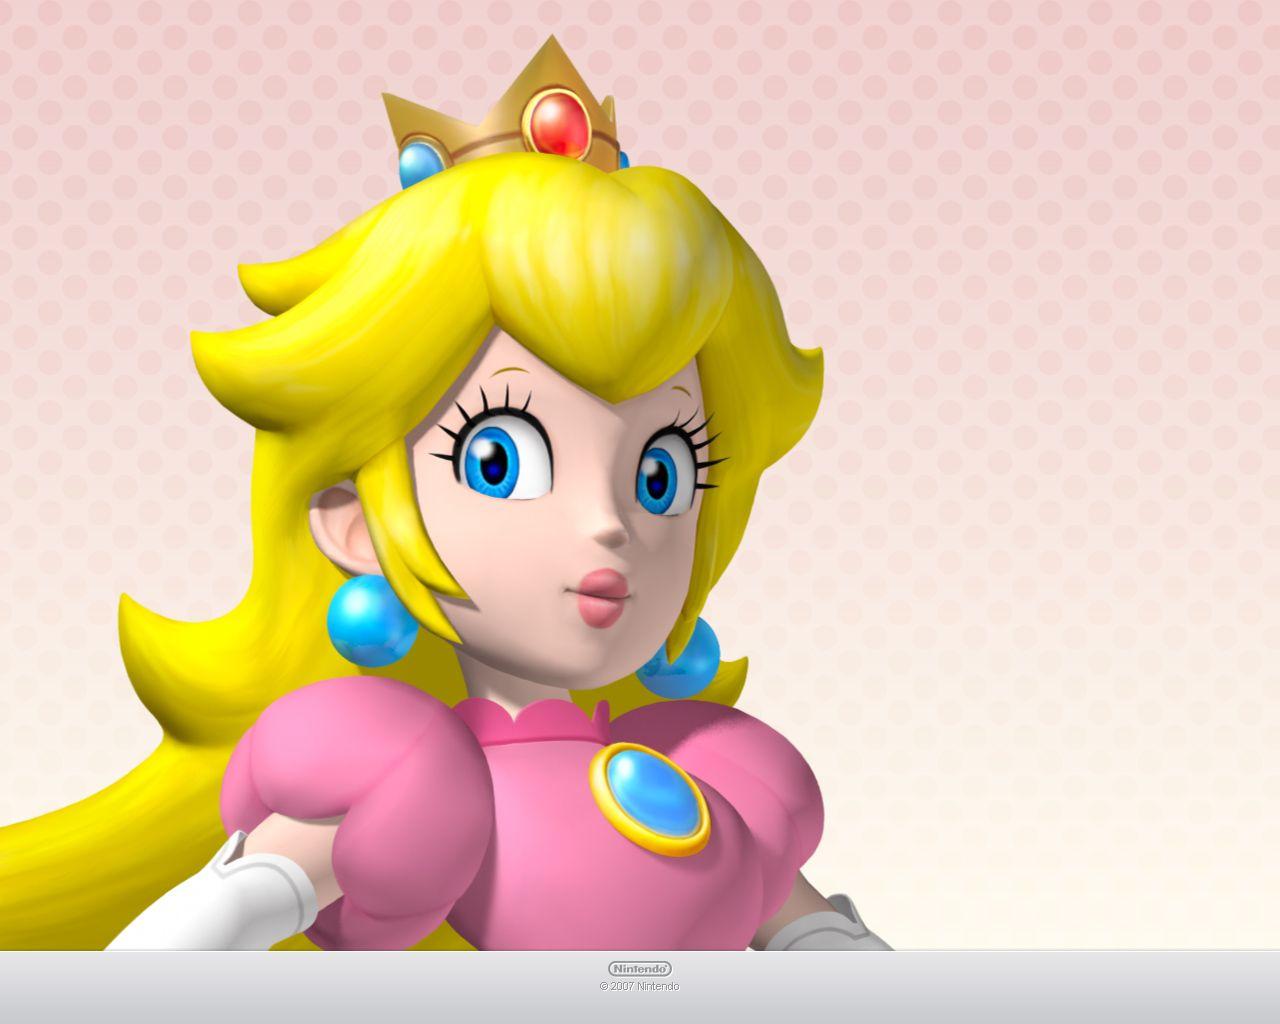 Princess Peach  Nintendo Wallpaper 25771035  Fanpop  Princess